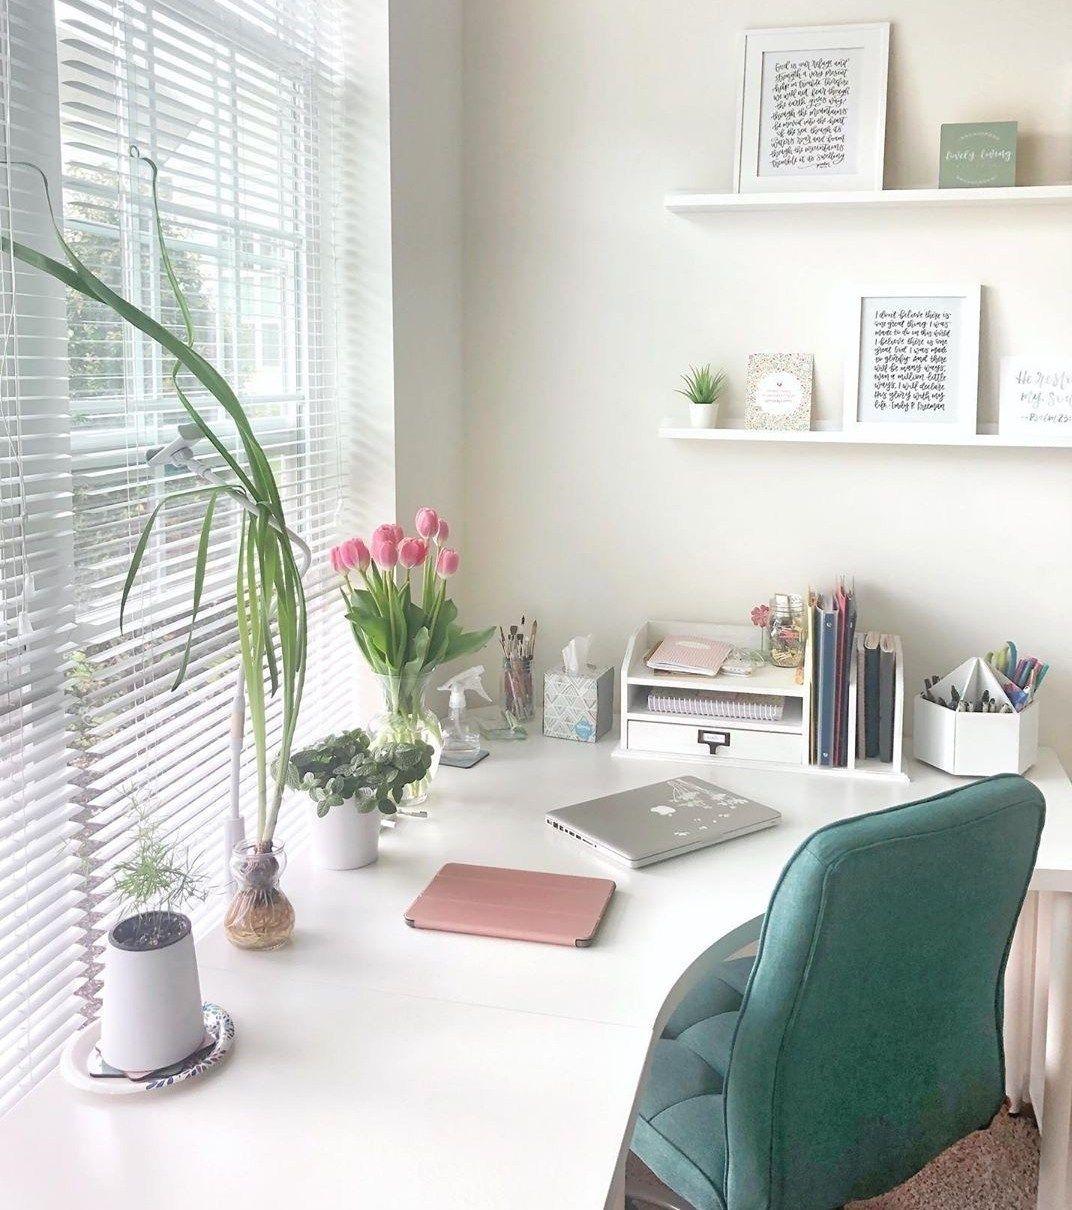 The Best Work Space Ideas Corner Desks Ikea Hacks Green Office Chair Blogging Space Work From In 2020 Ikea Home Office Pink Home Offices Home Office Design